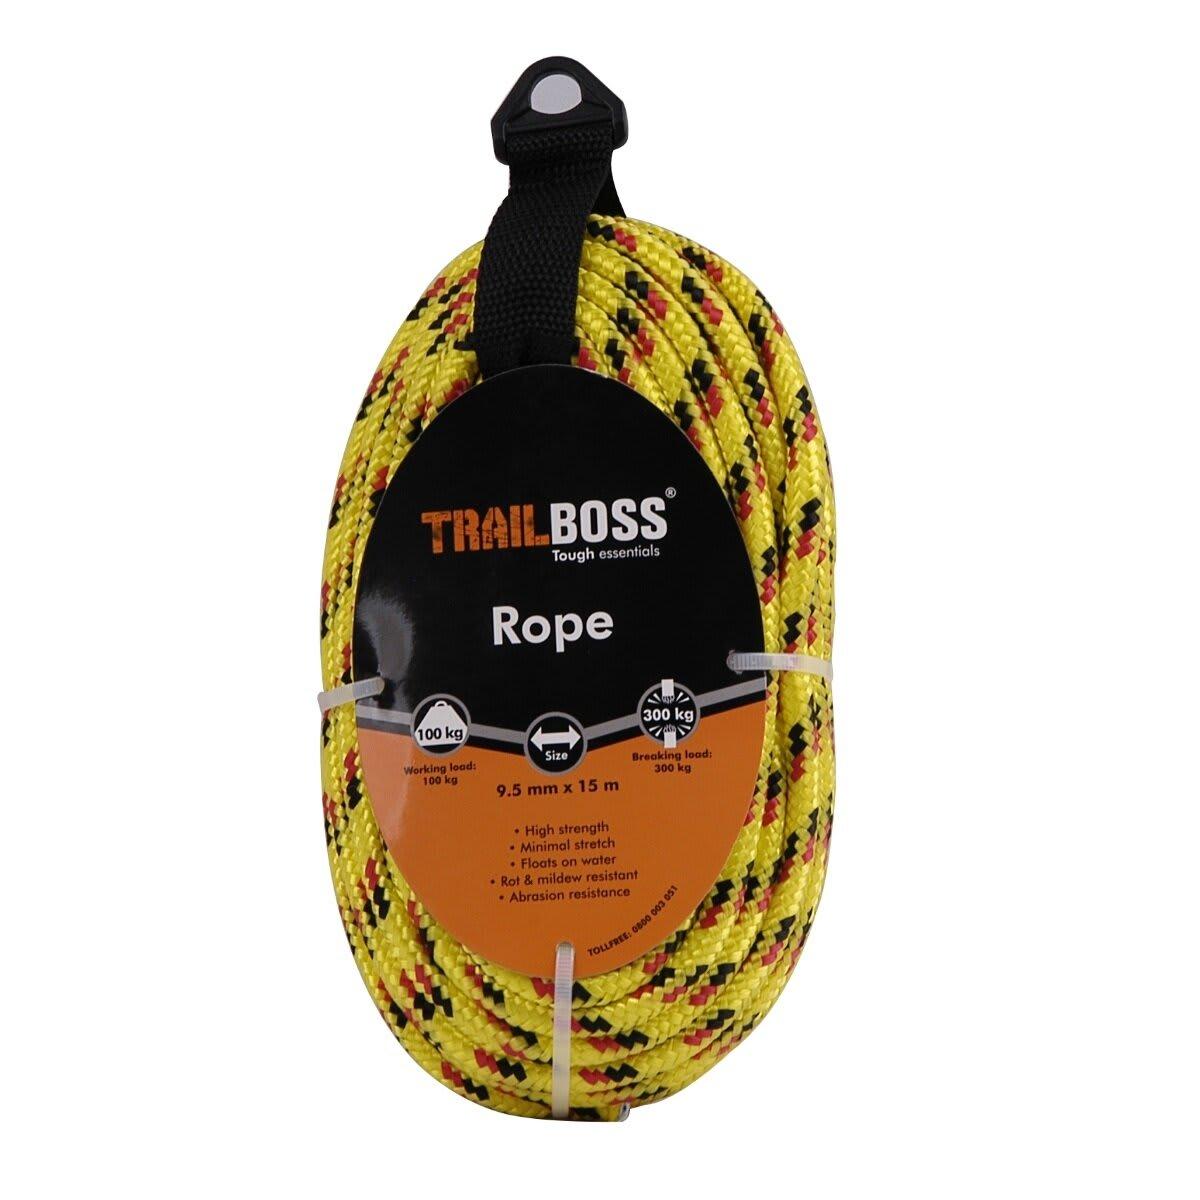 TrailBoss 9.5mm x 15m Rope